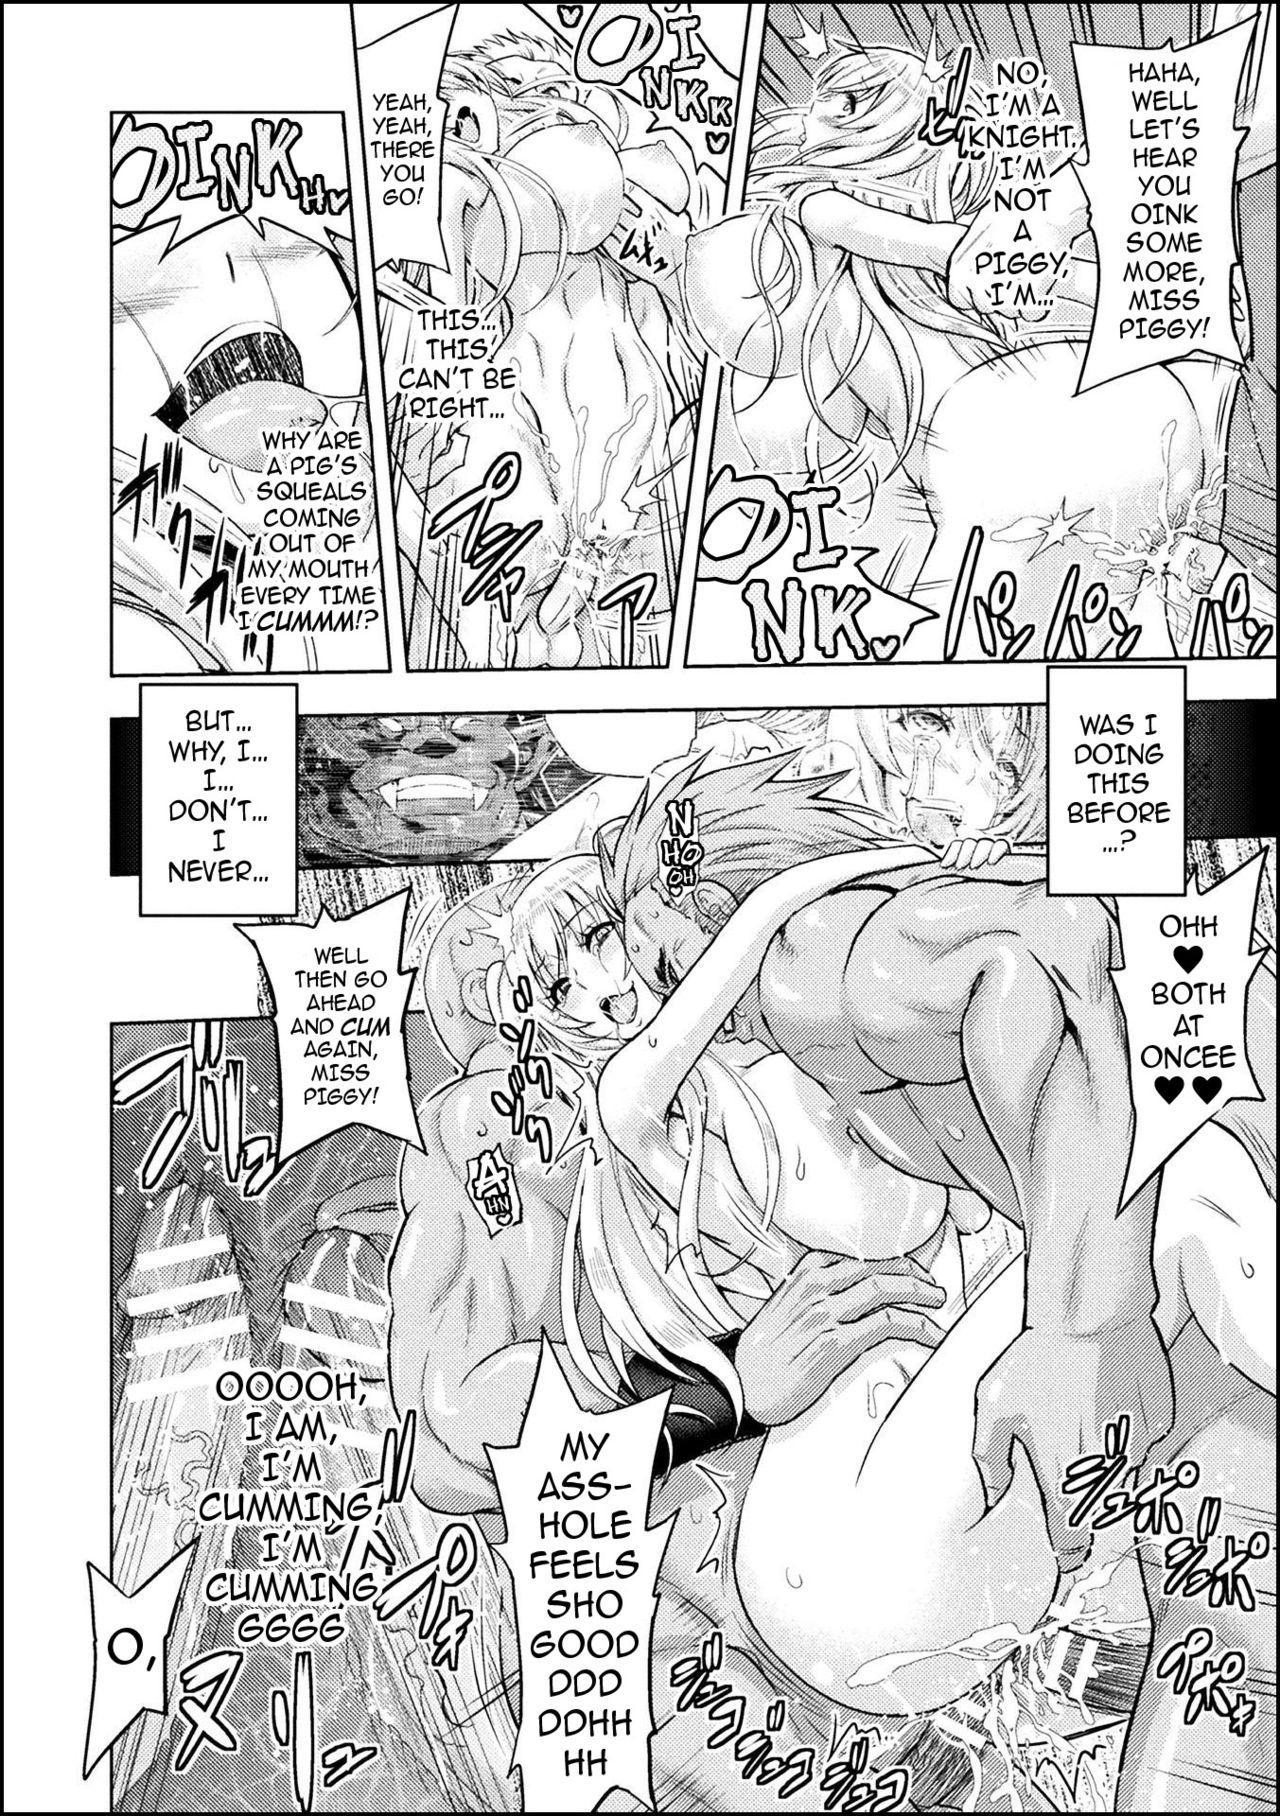 [Yamada Gogogo] Erona ~Orc no Inmon ni Okasareta Onna Kishi no Matsuro~ | Erona ~The Fall of a Beautiful Knight Cursed with the Lewd Mark of an Orc~ [English] {darknight} 150